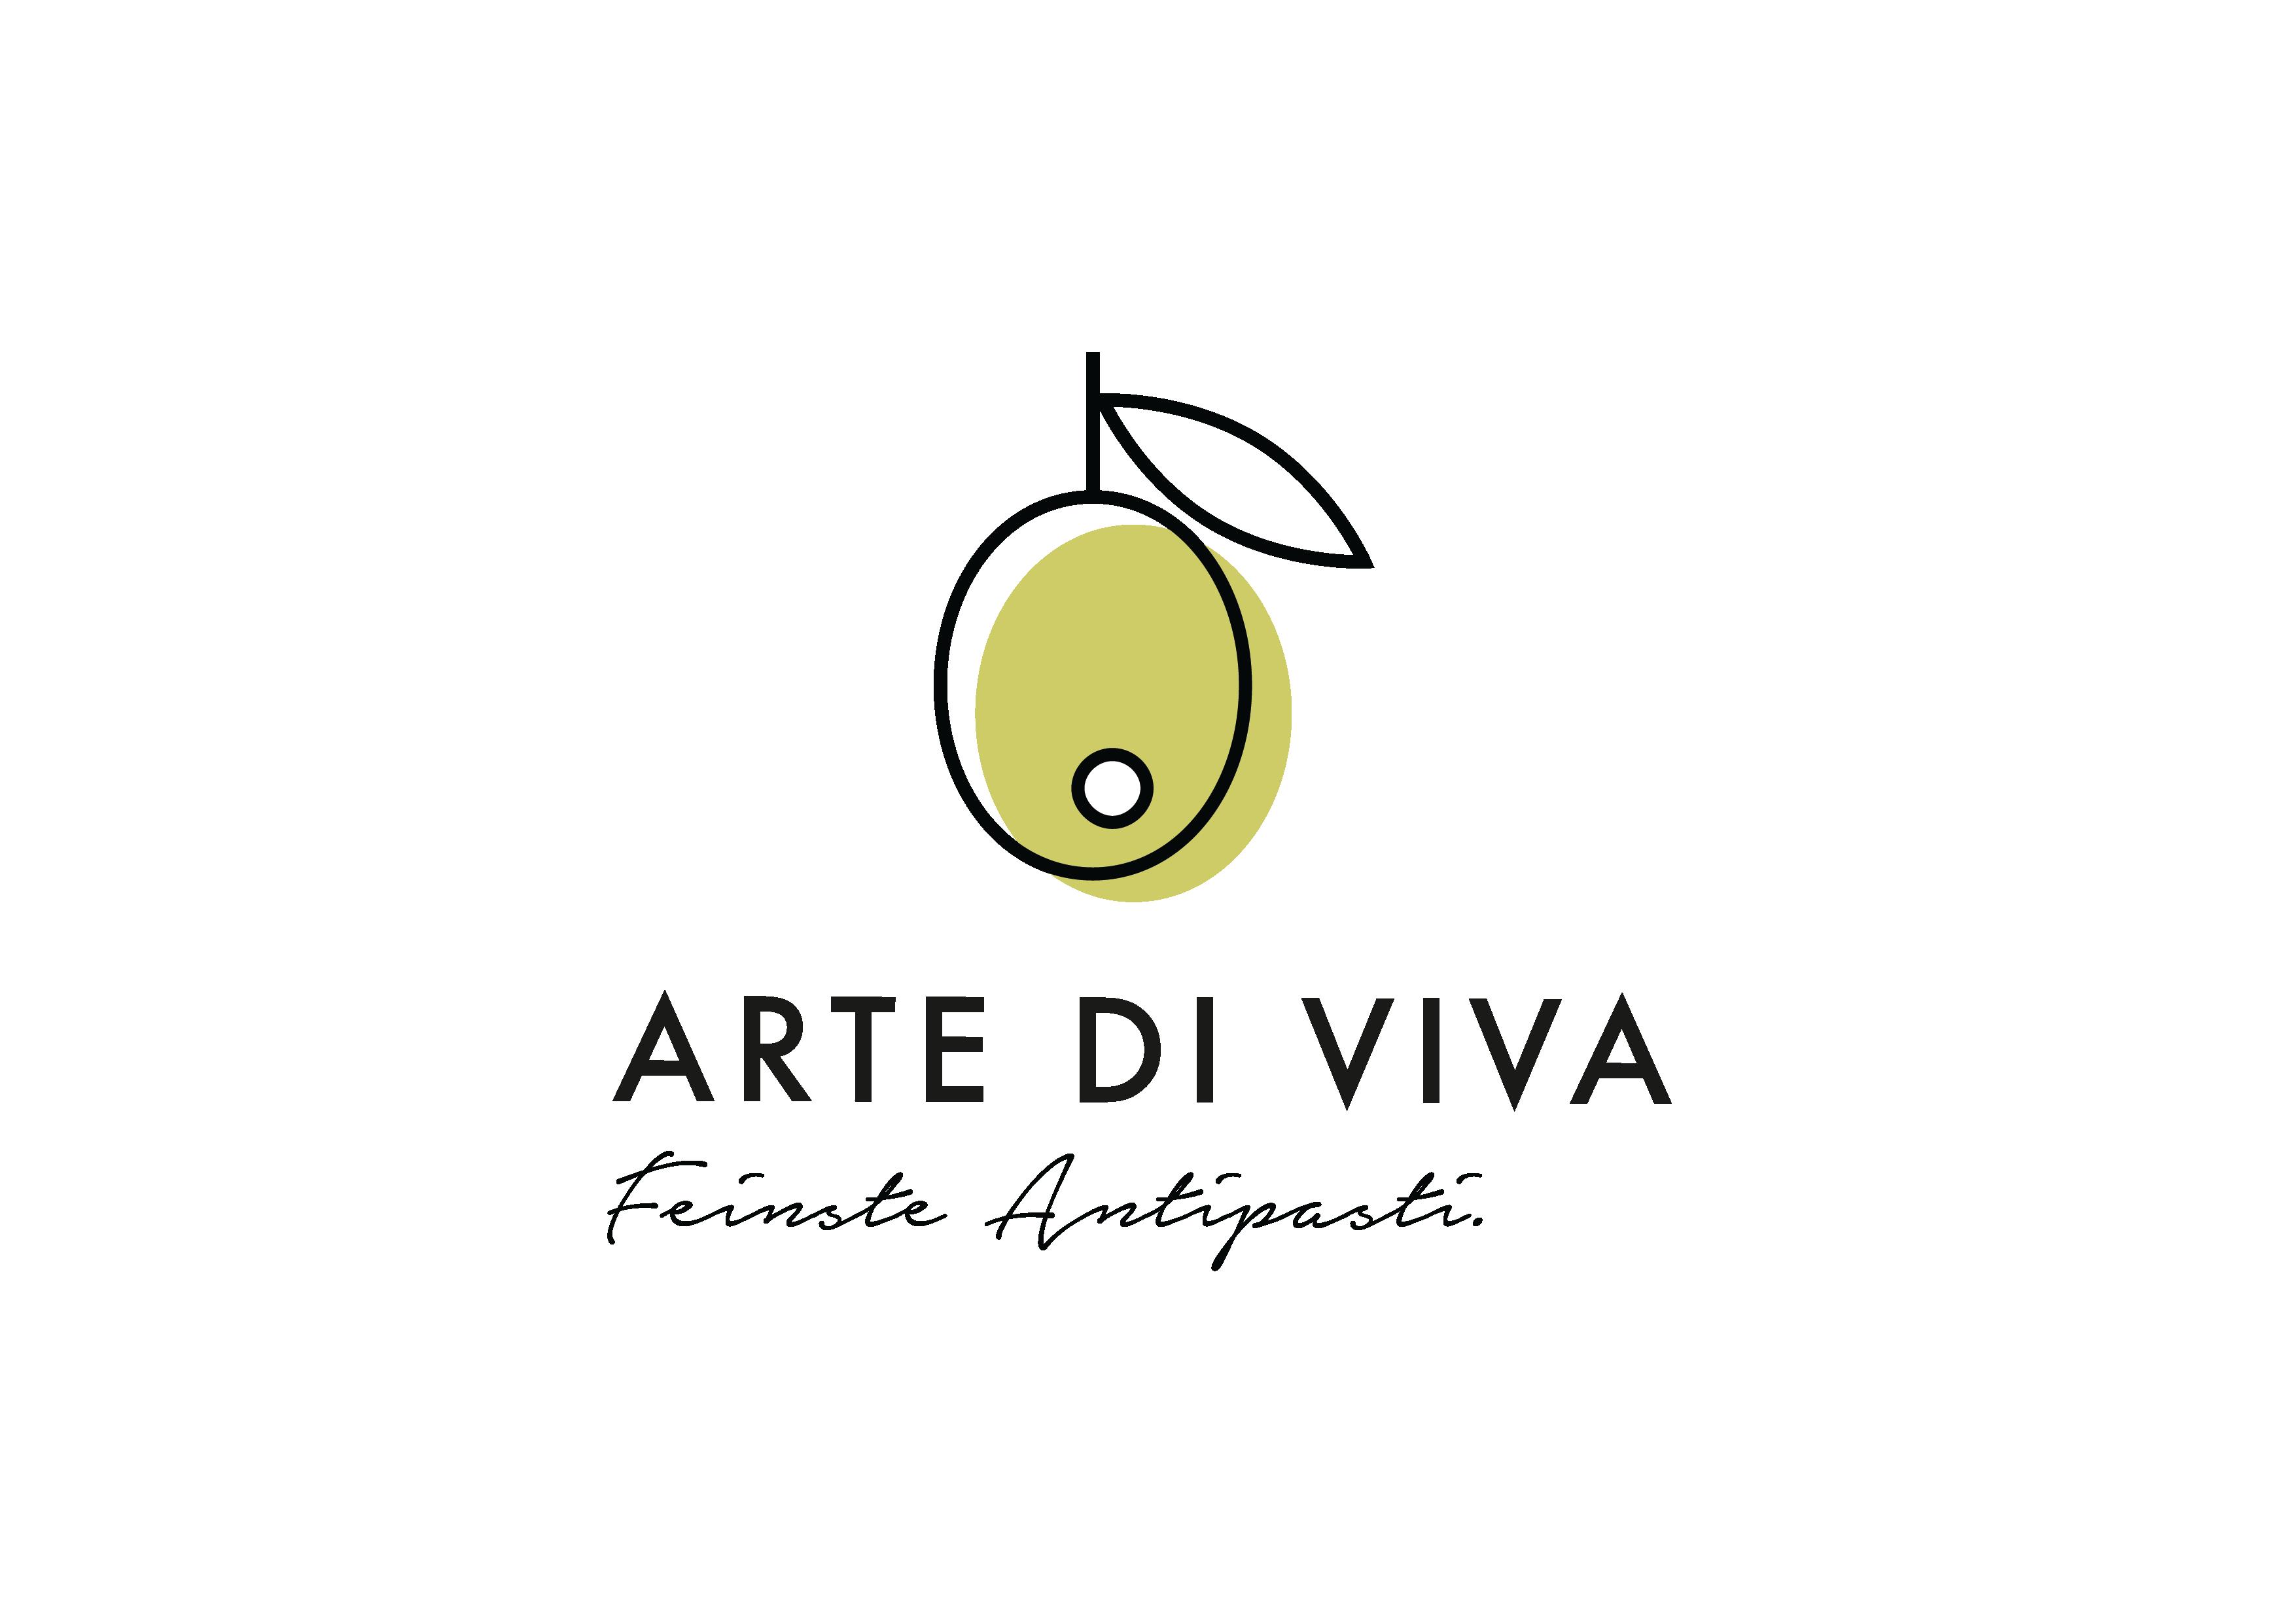 Arte Di Viva Frische Und Service